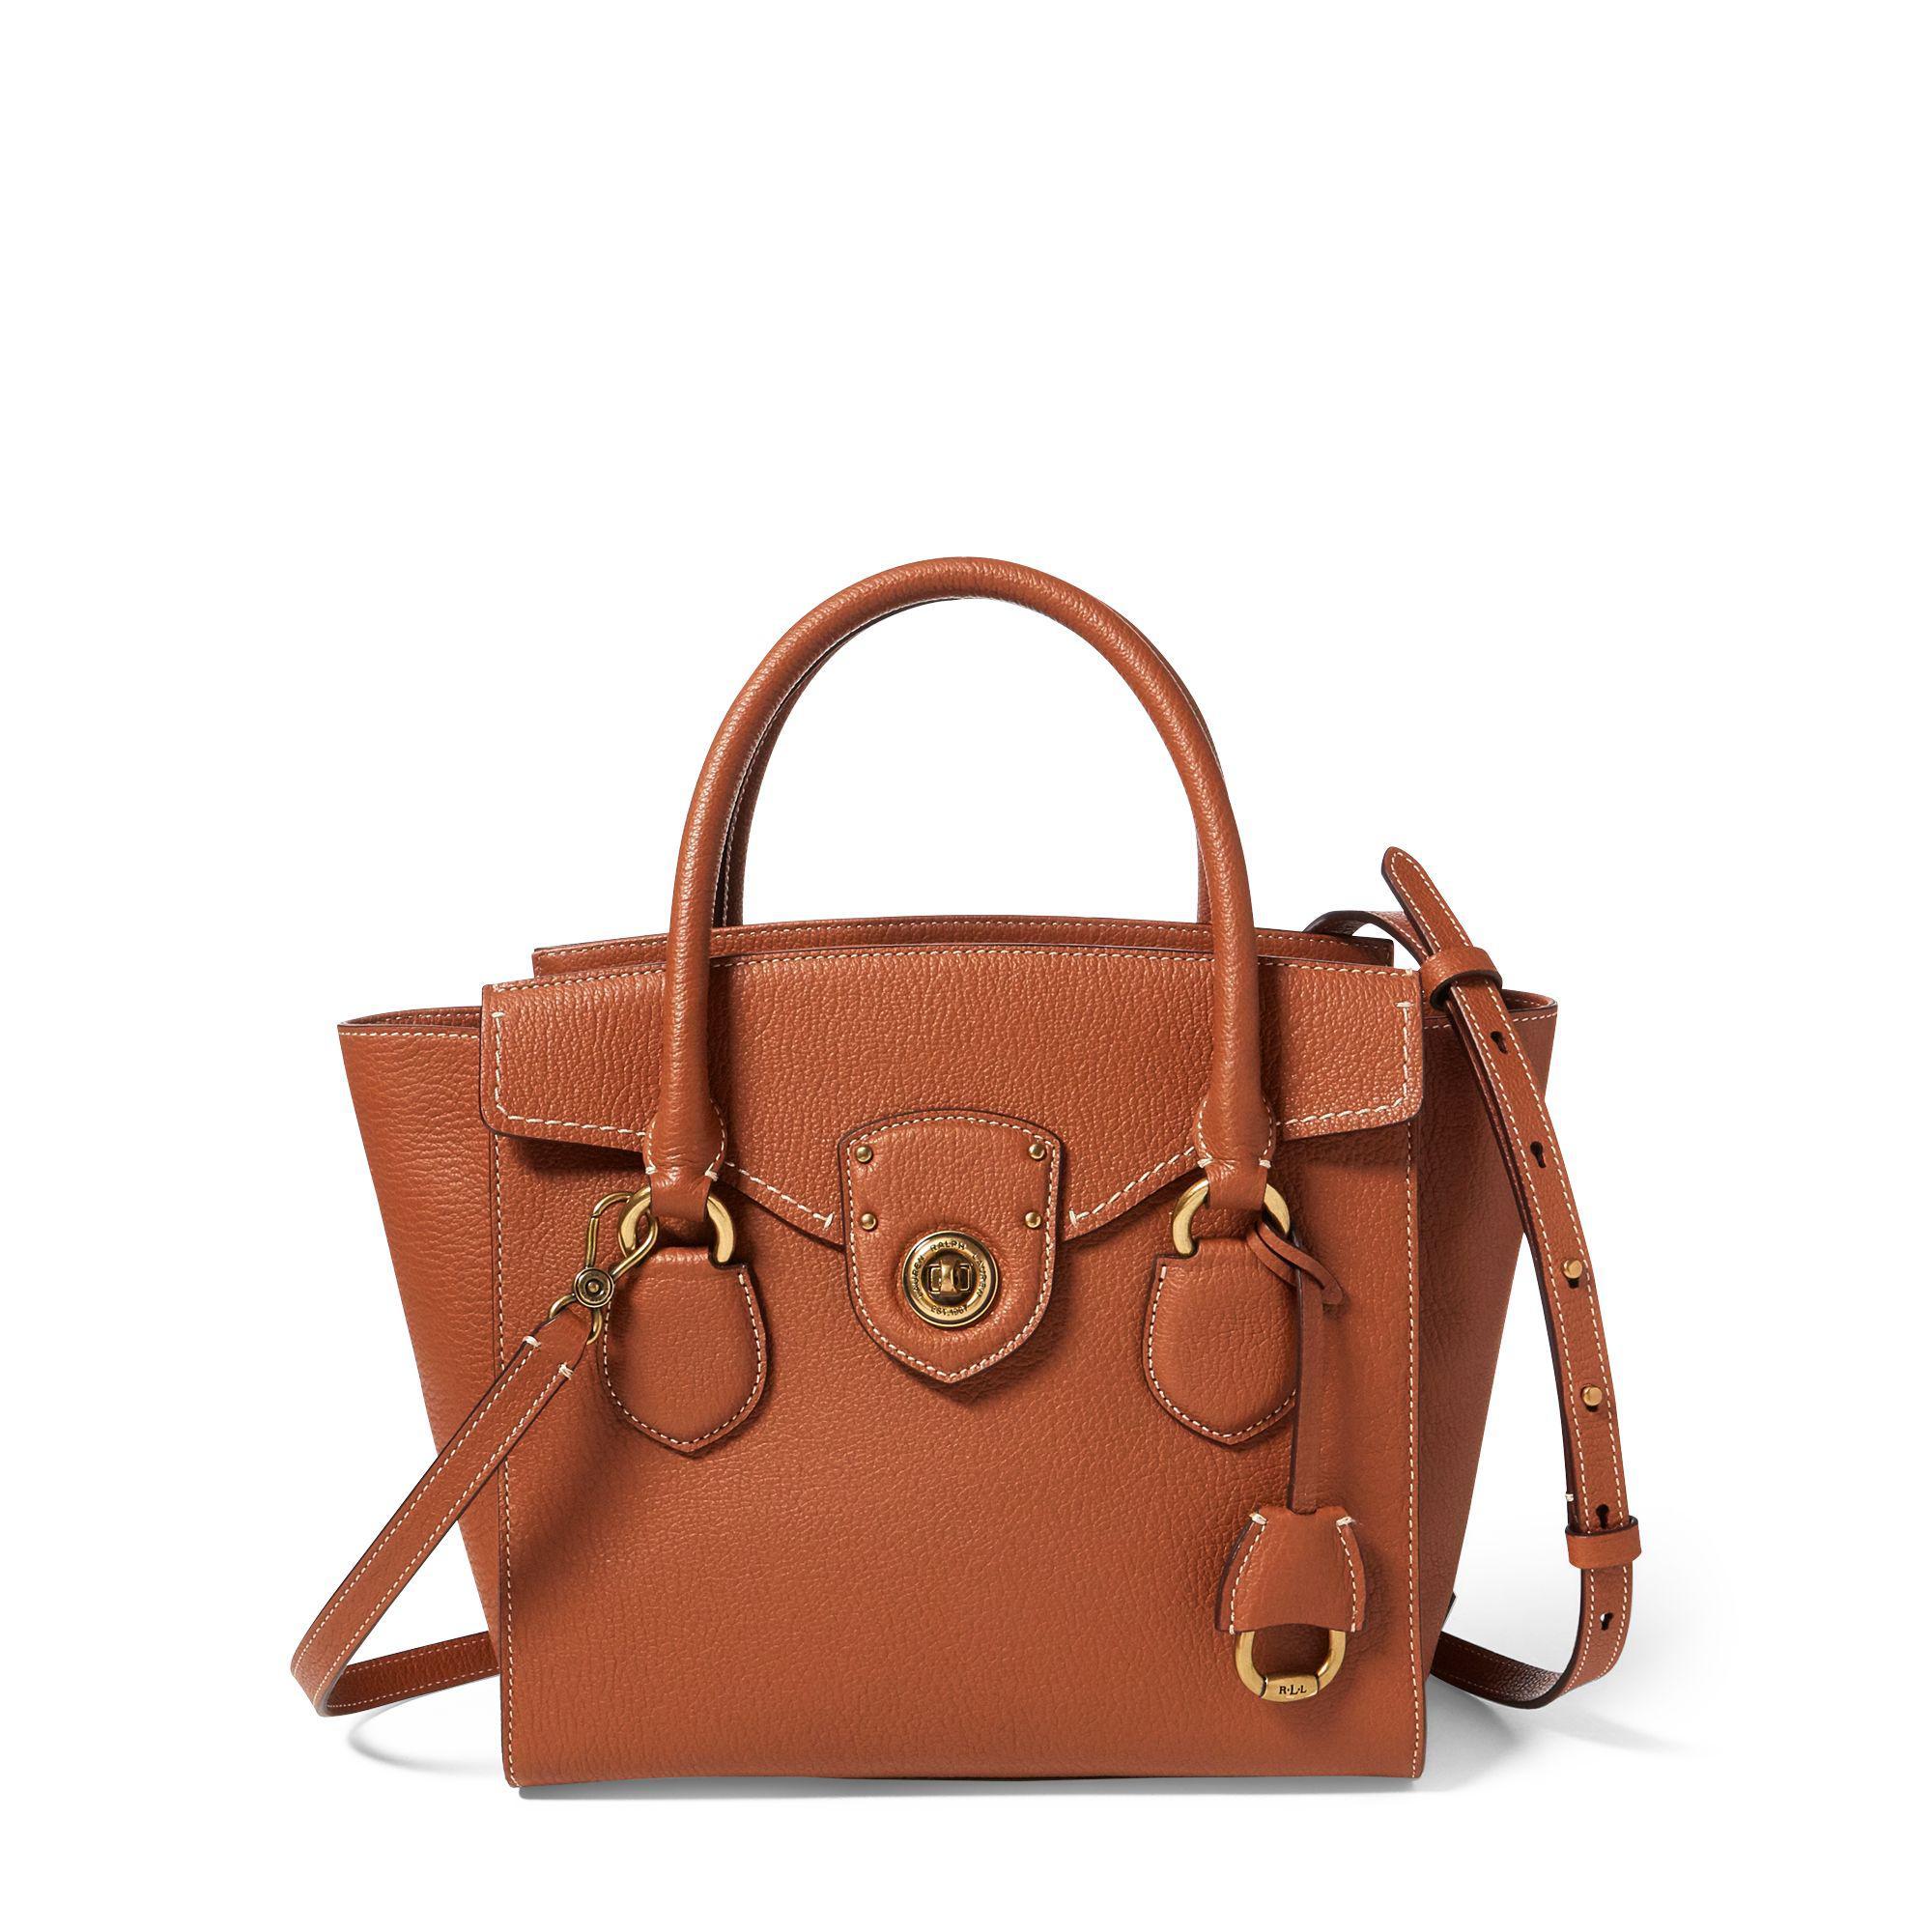 Ralph Lauren Pebbled Leather Medium Satchel in Brown - Lyst 8f68cd0b88